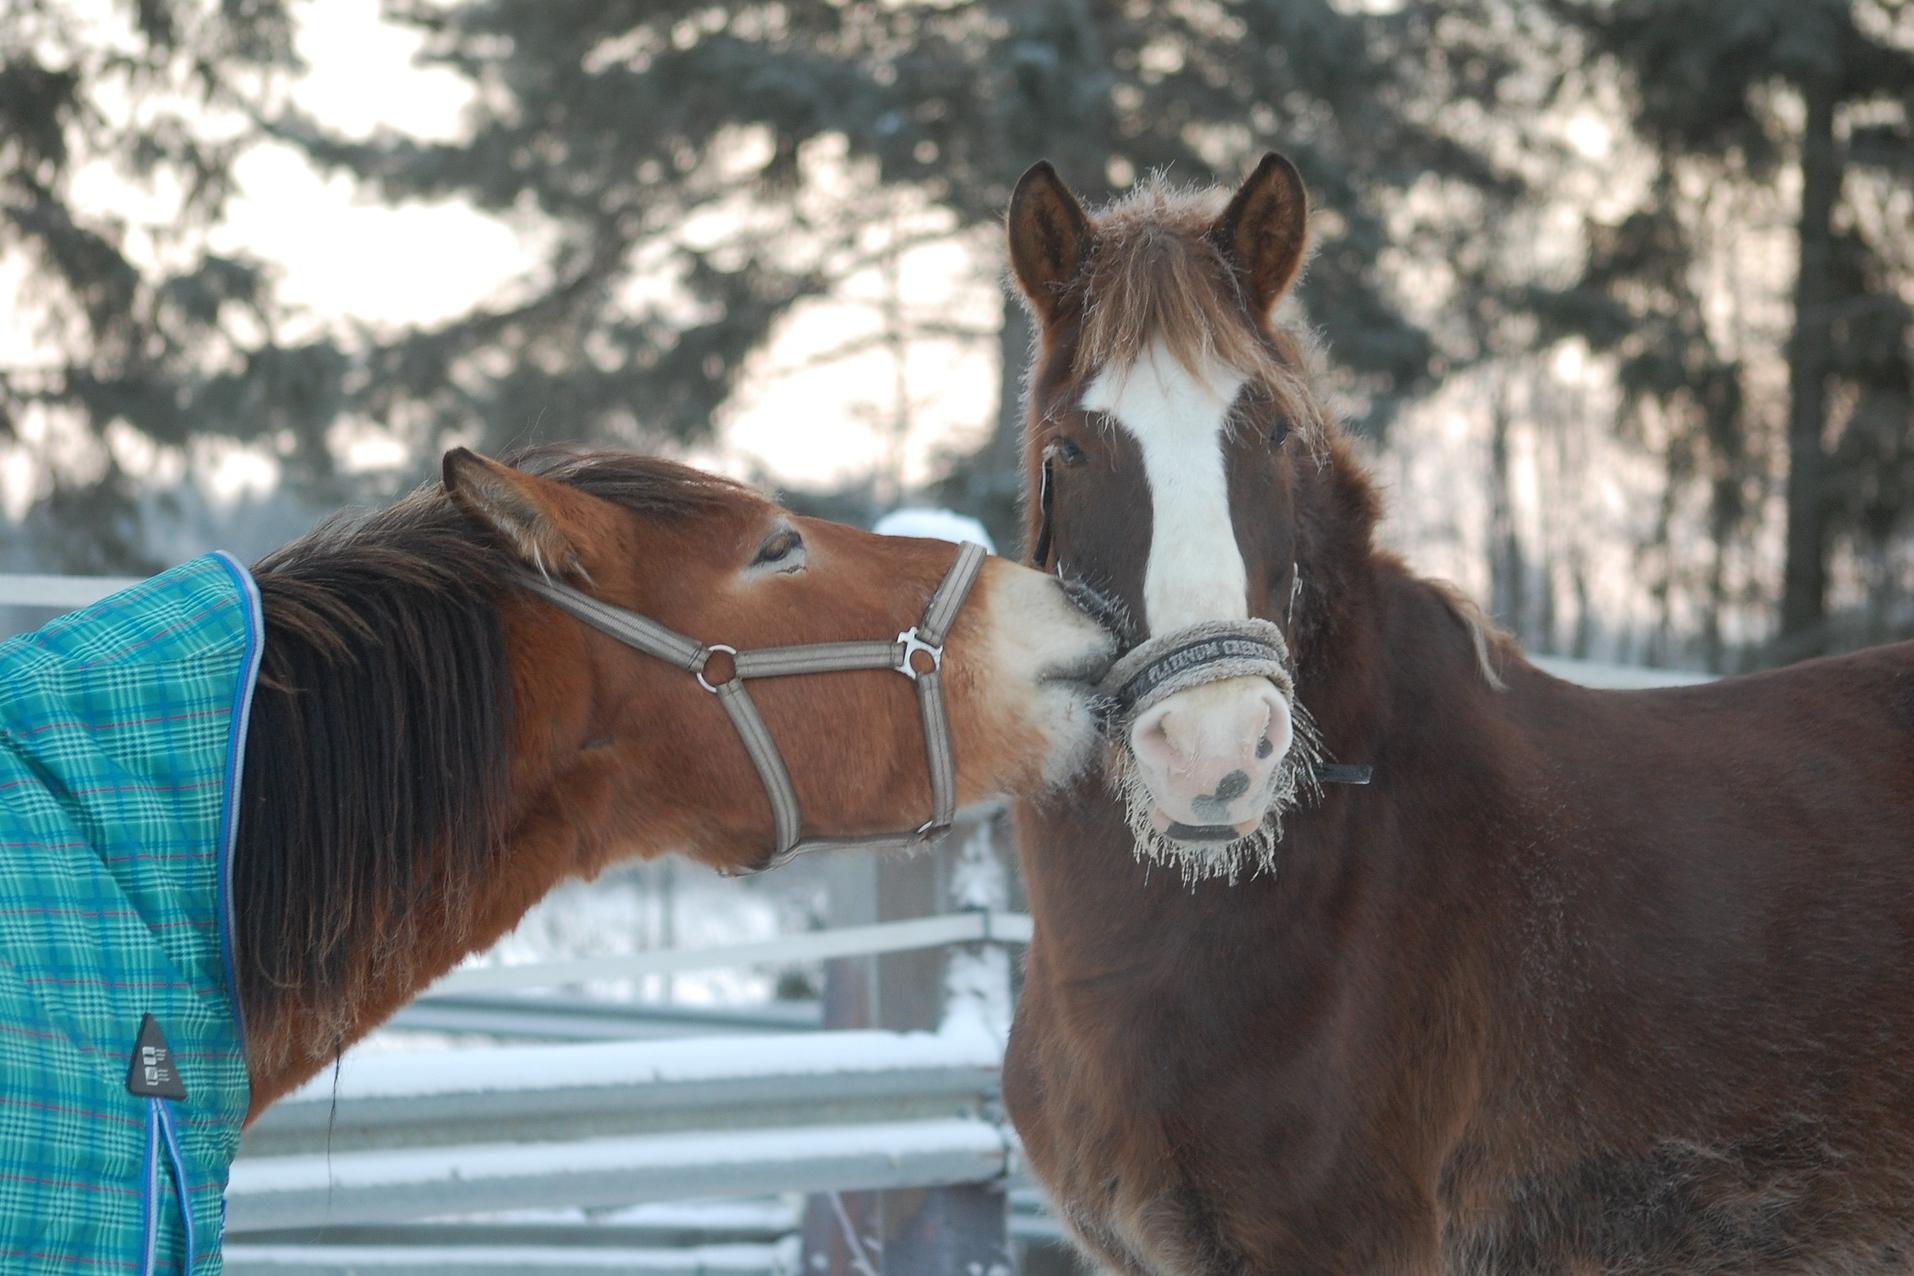 horse-752833_1920